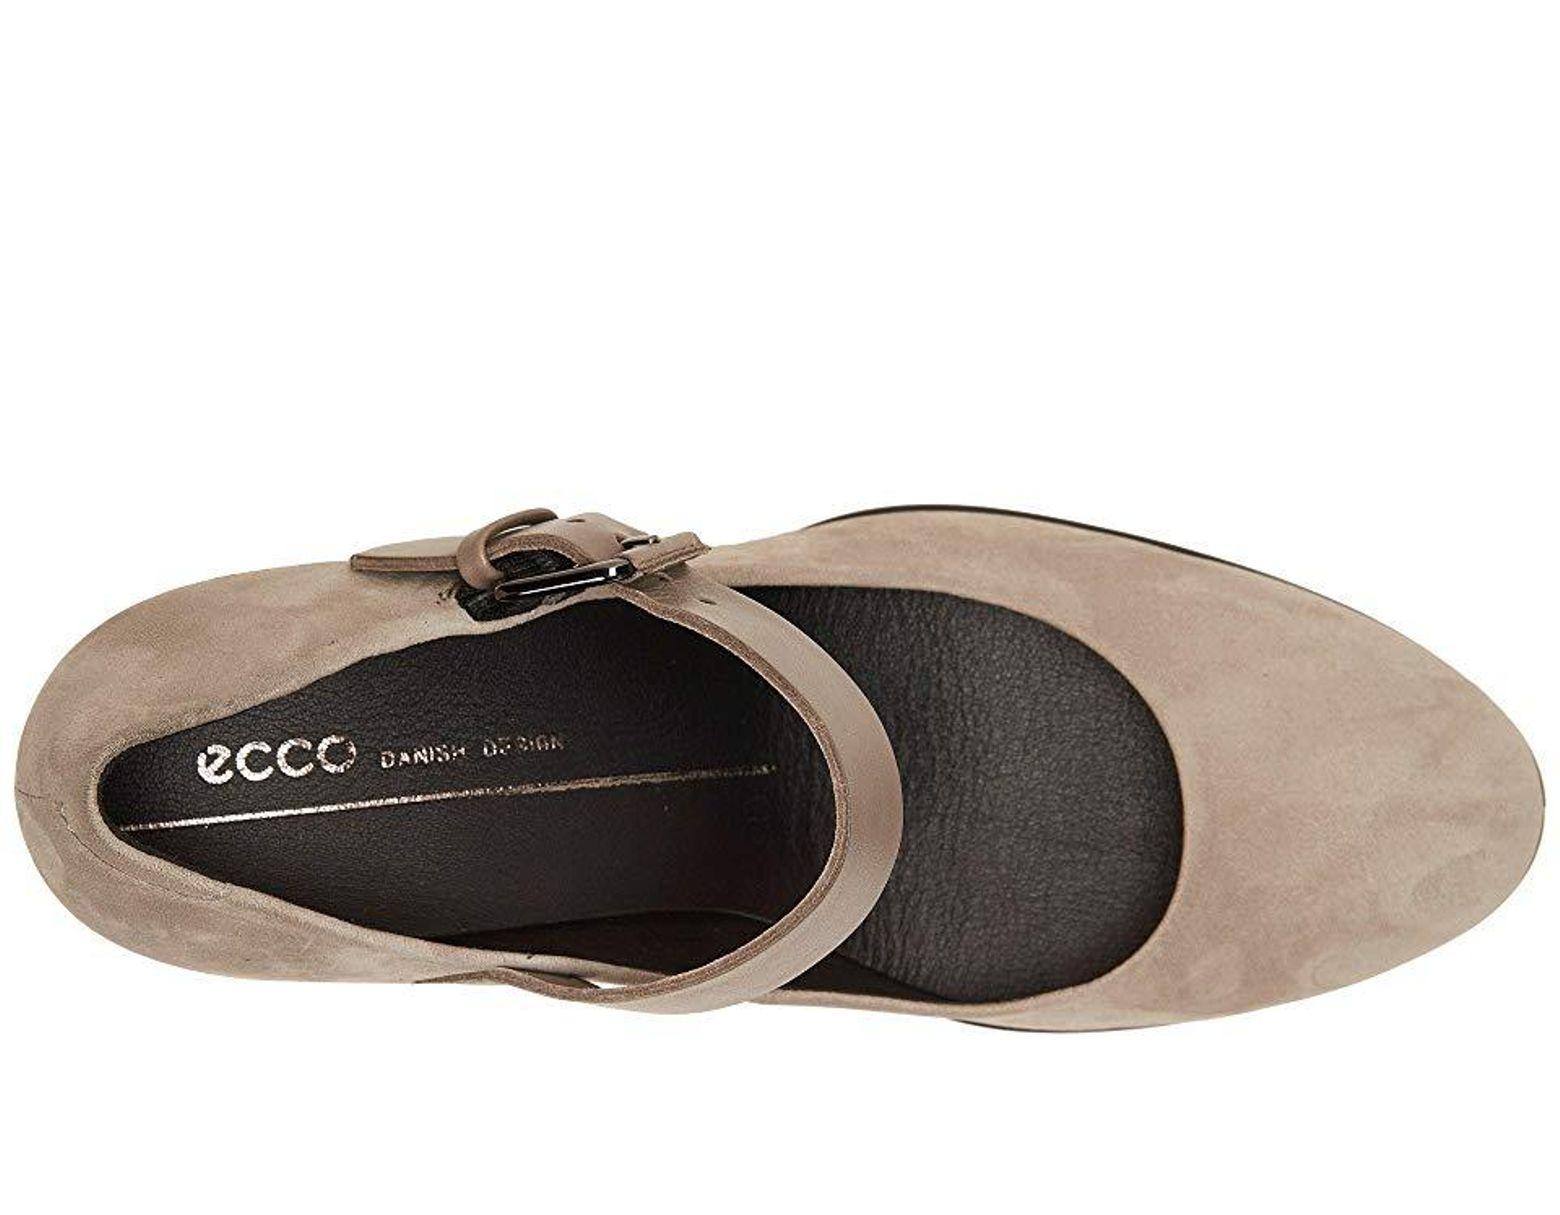 562ca5f85fbe8 Ecco Shape 55 Plateau Mary Jane Pump (warm Grey/stone Calf Nubuck/cow  Leather) High Heels in Gray - Save 30% - Lyst